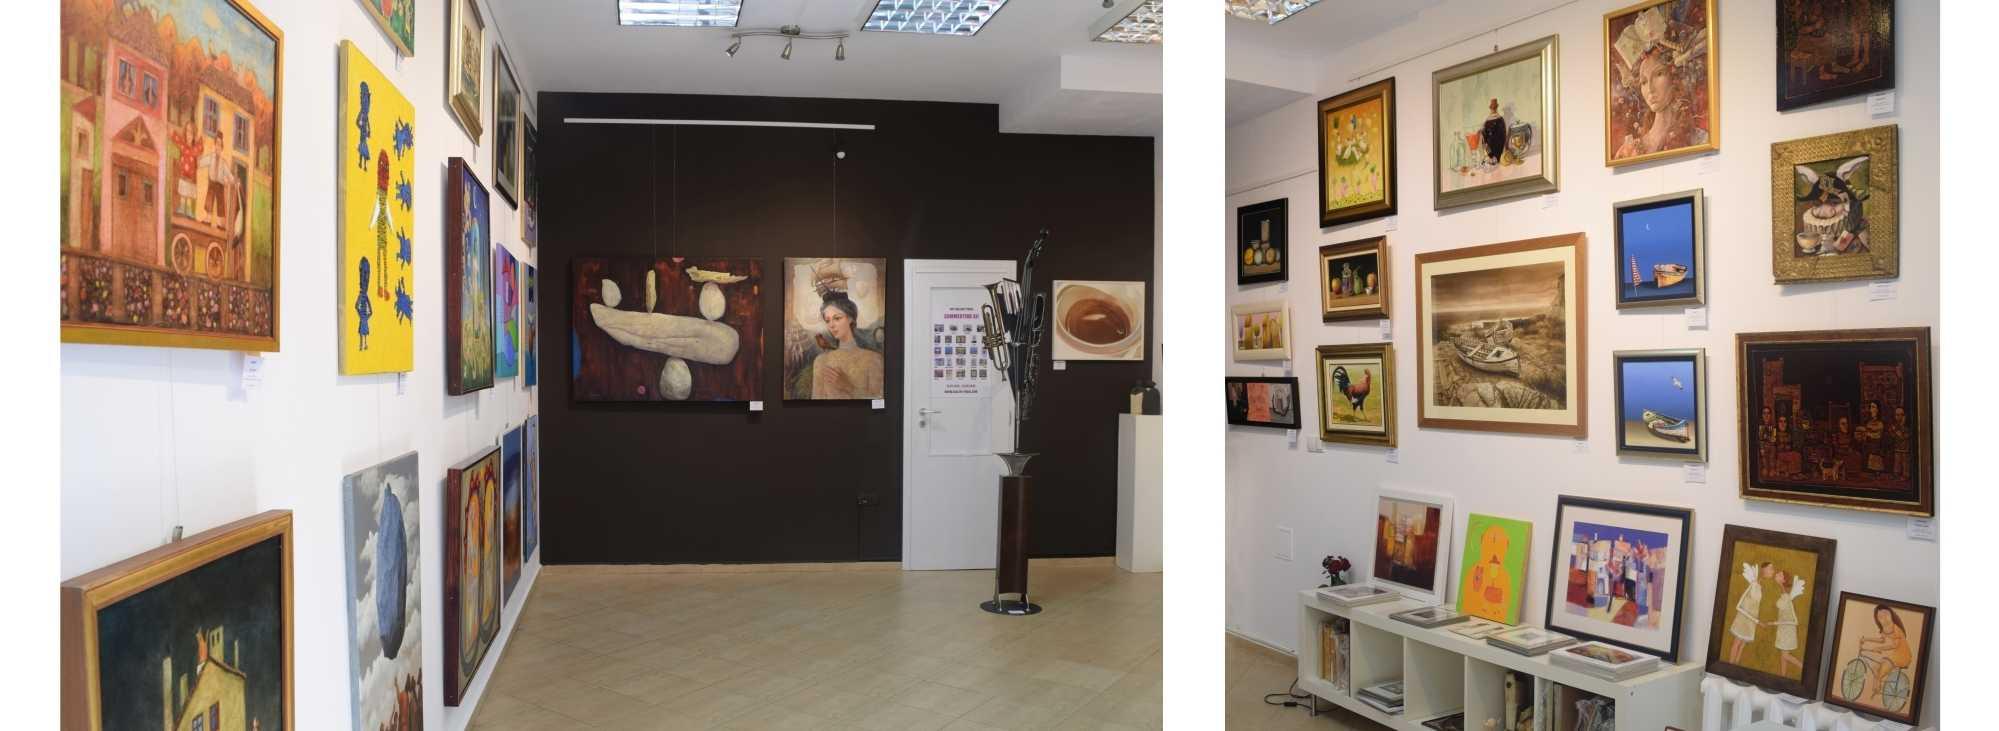 Gallery Paris - kartini za prodazhba